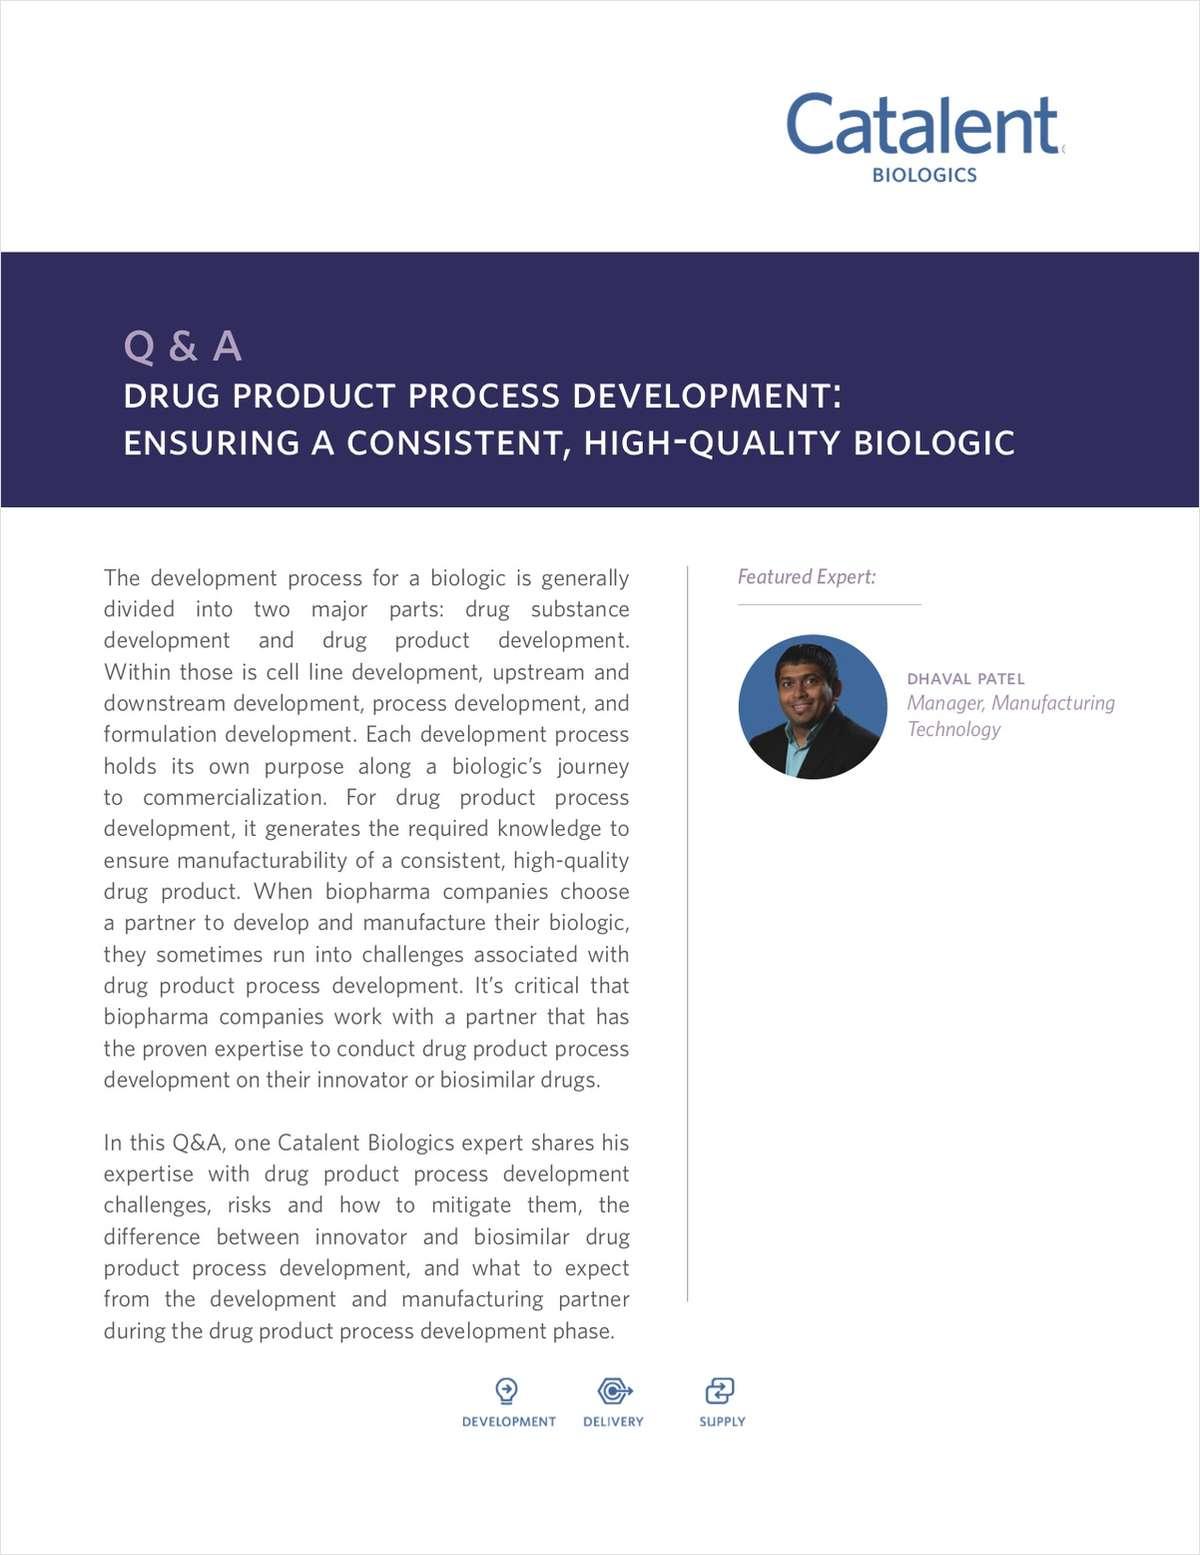 Drug Product Process Development: Ensuring a Consistent, High-quality Biologic